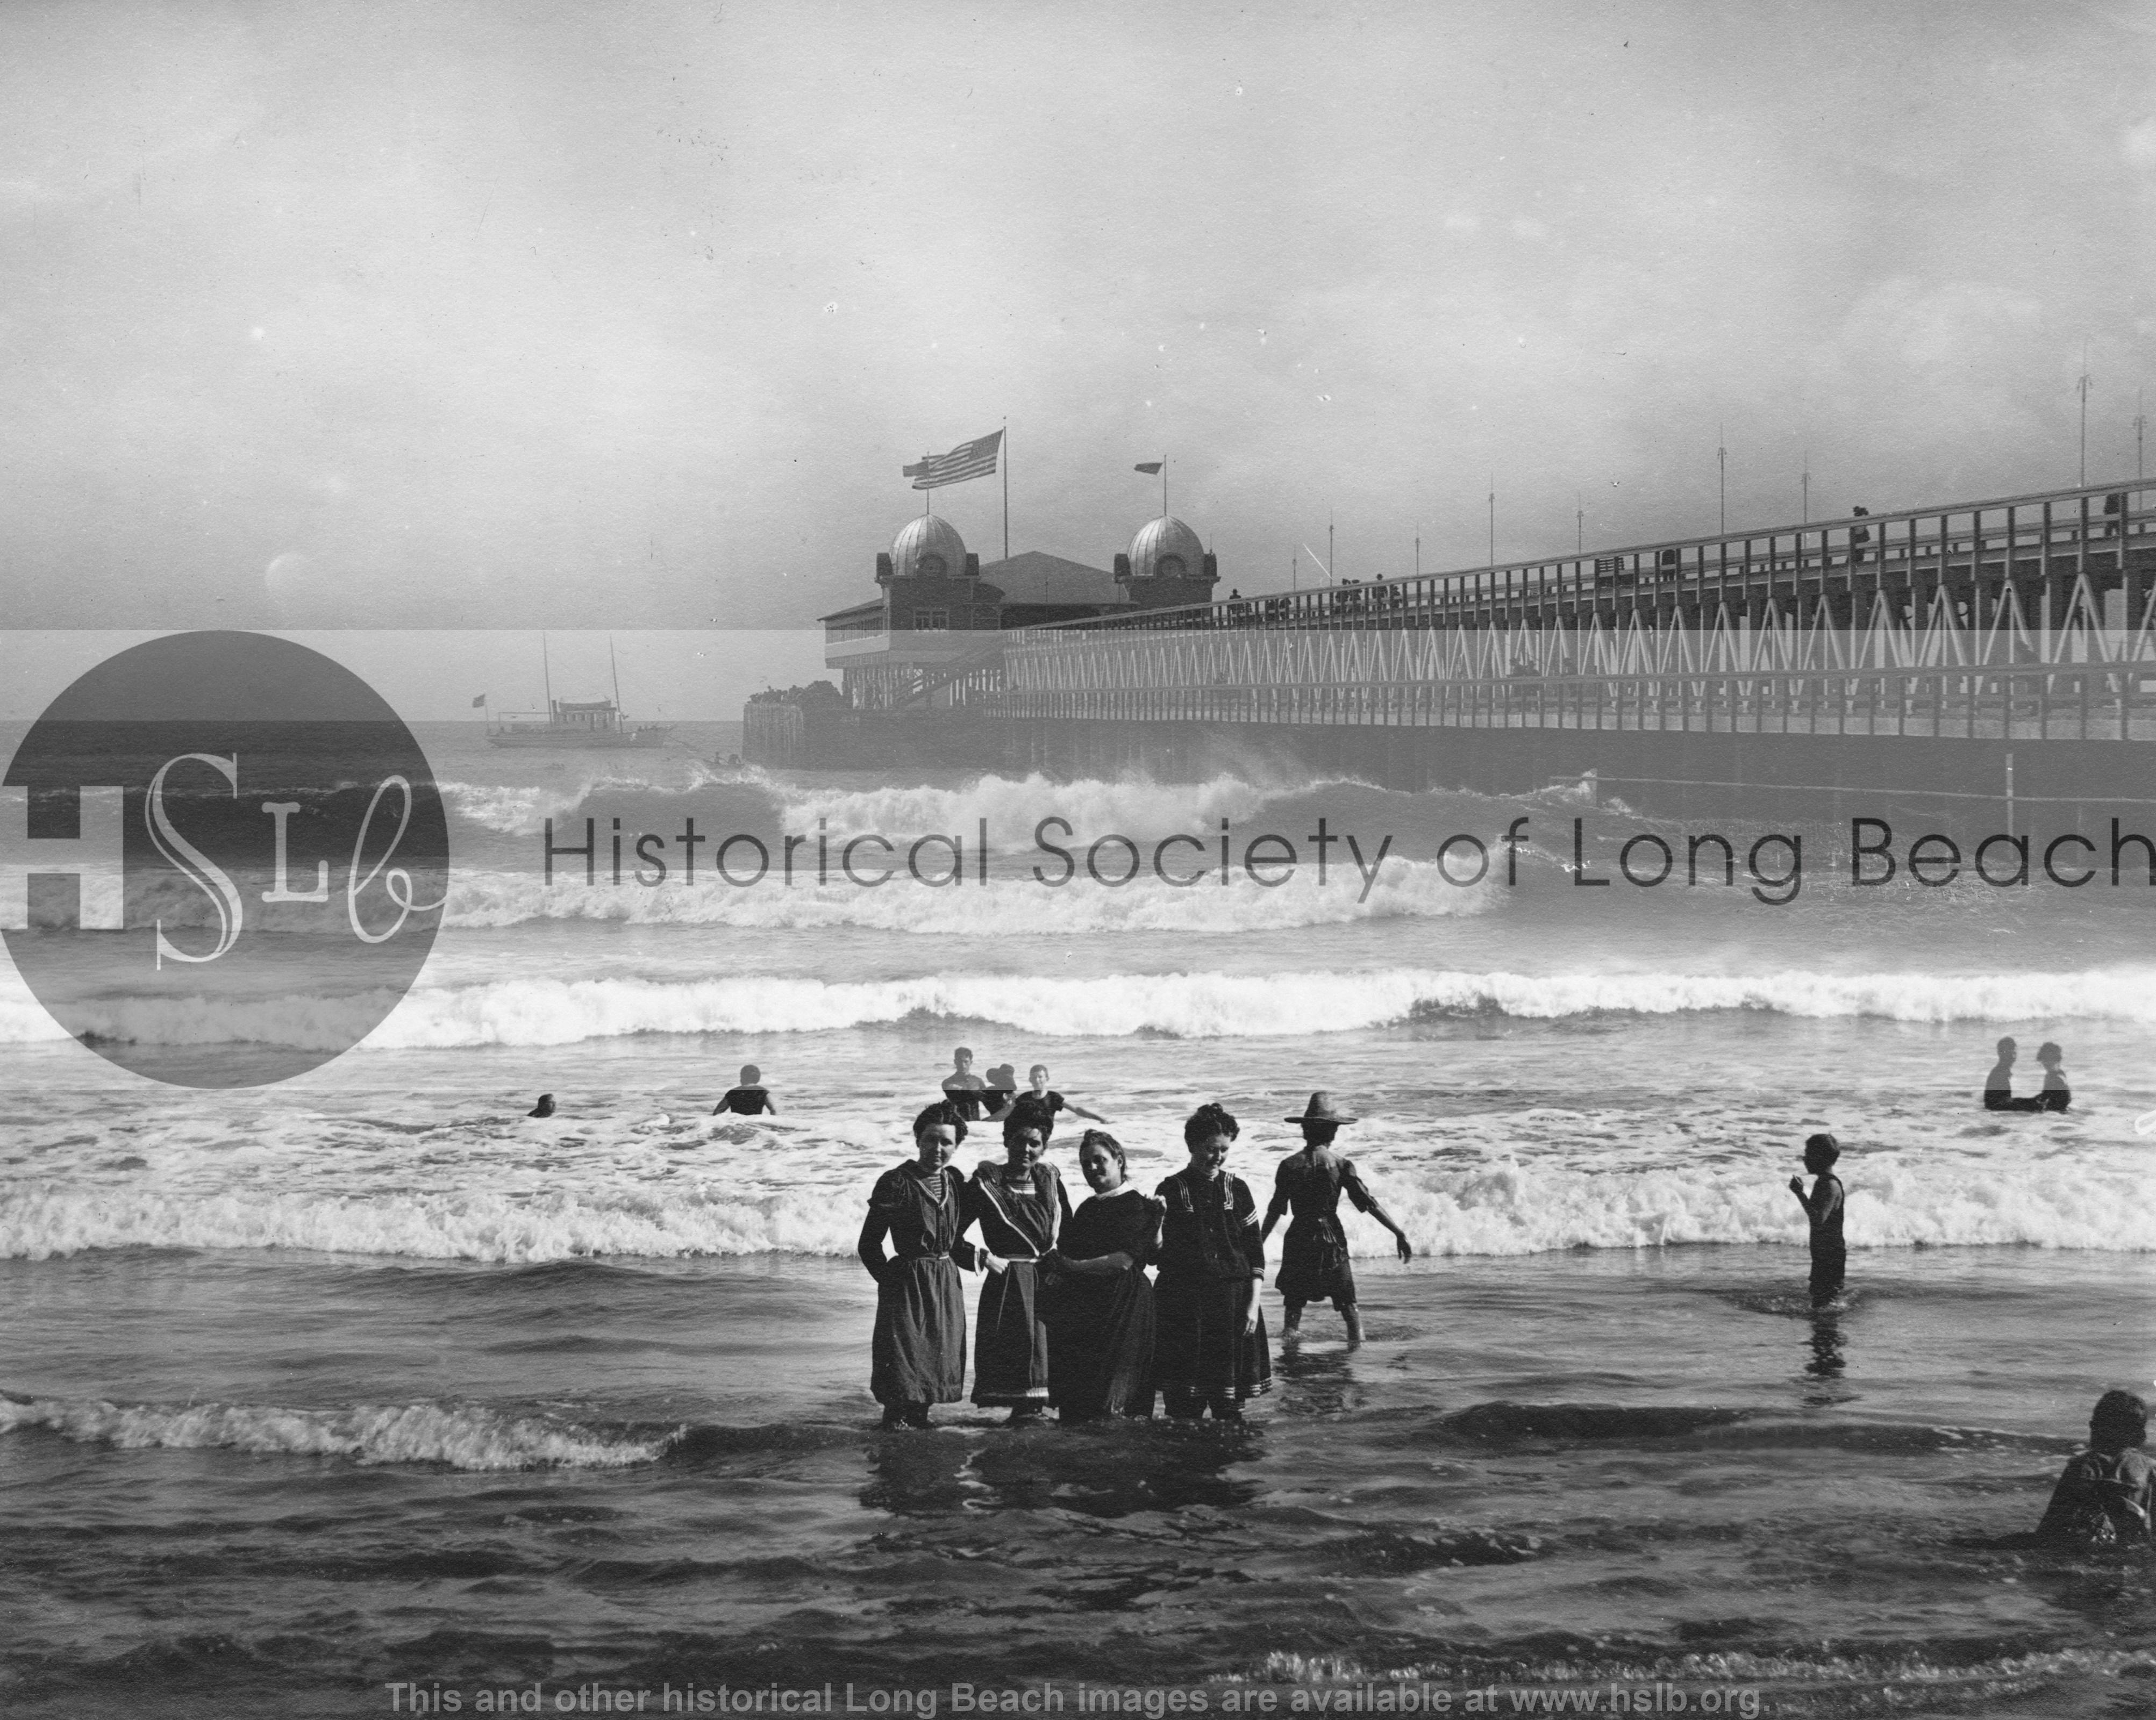 Bathers at Pine Ave. Pier, 1910 vintage photograph